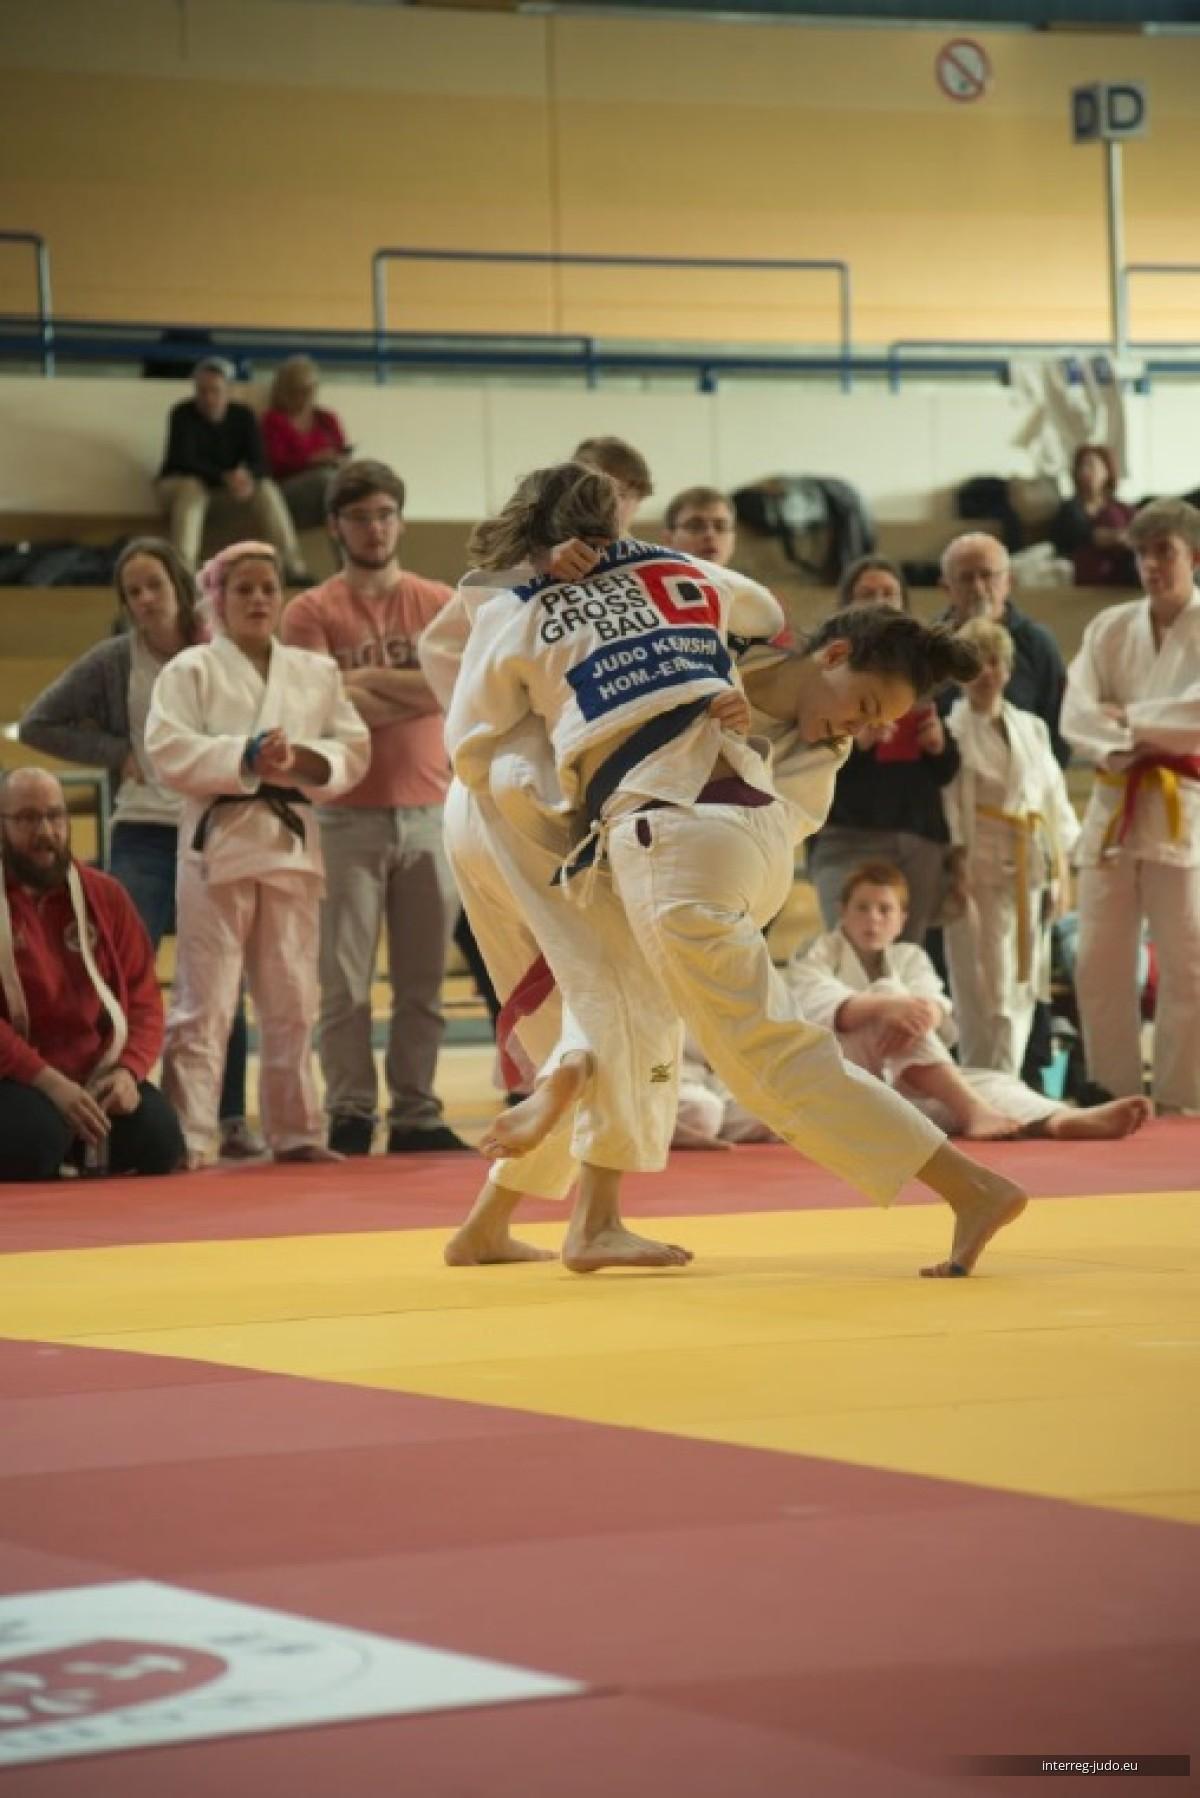 Fotos Interreg Judo Competition - 1. Lindenbaumturnier Homburg-Erbach